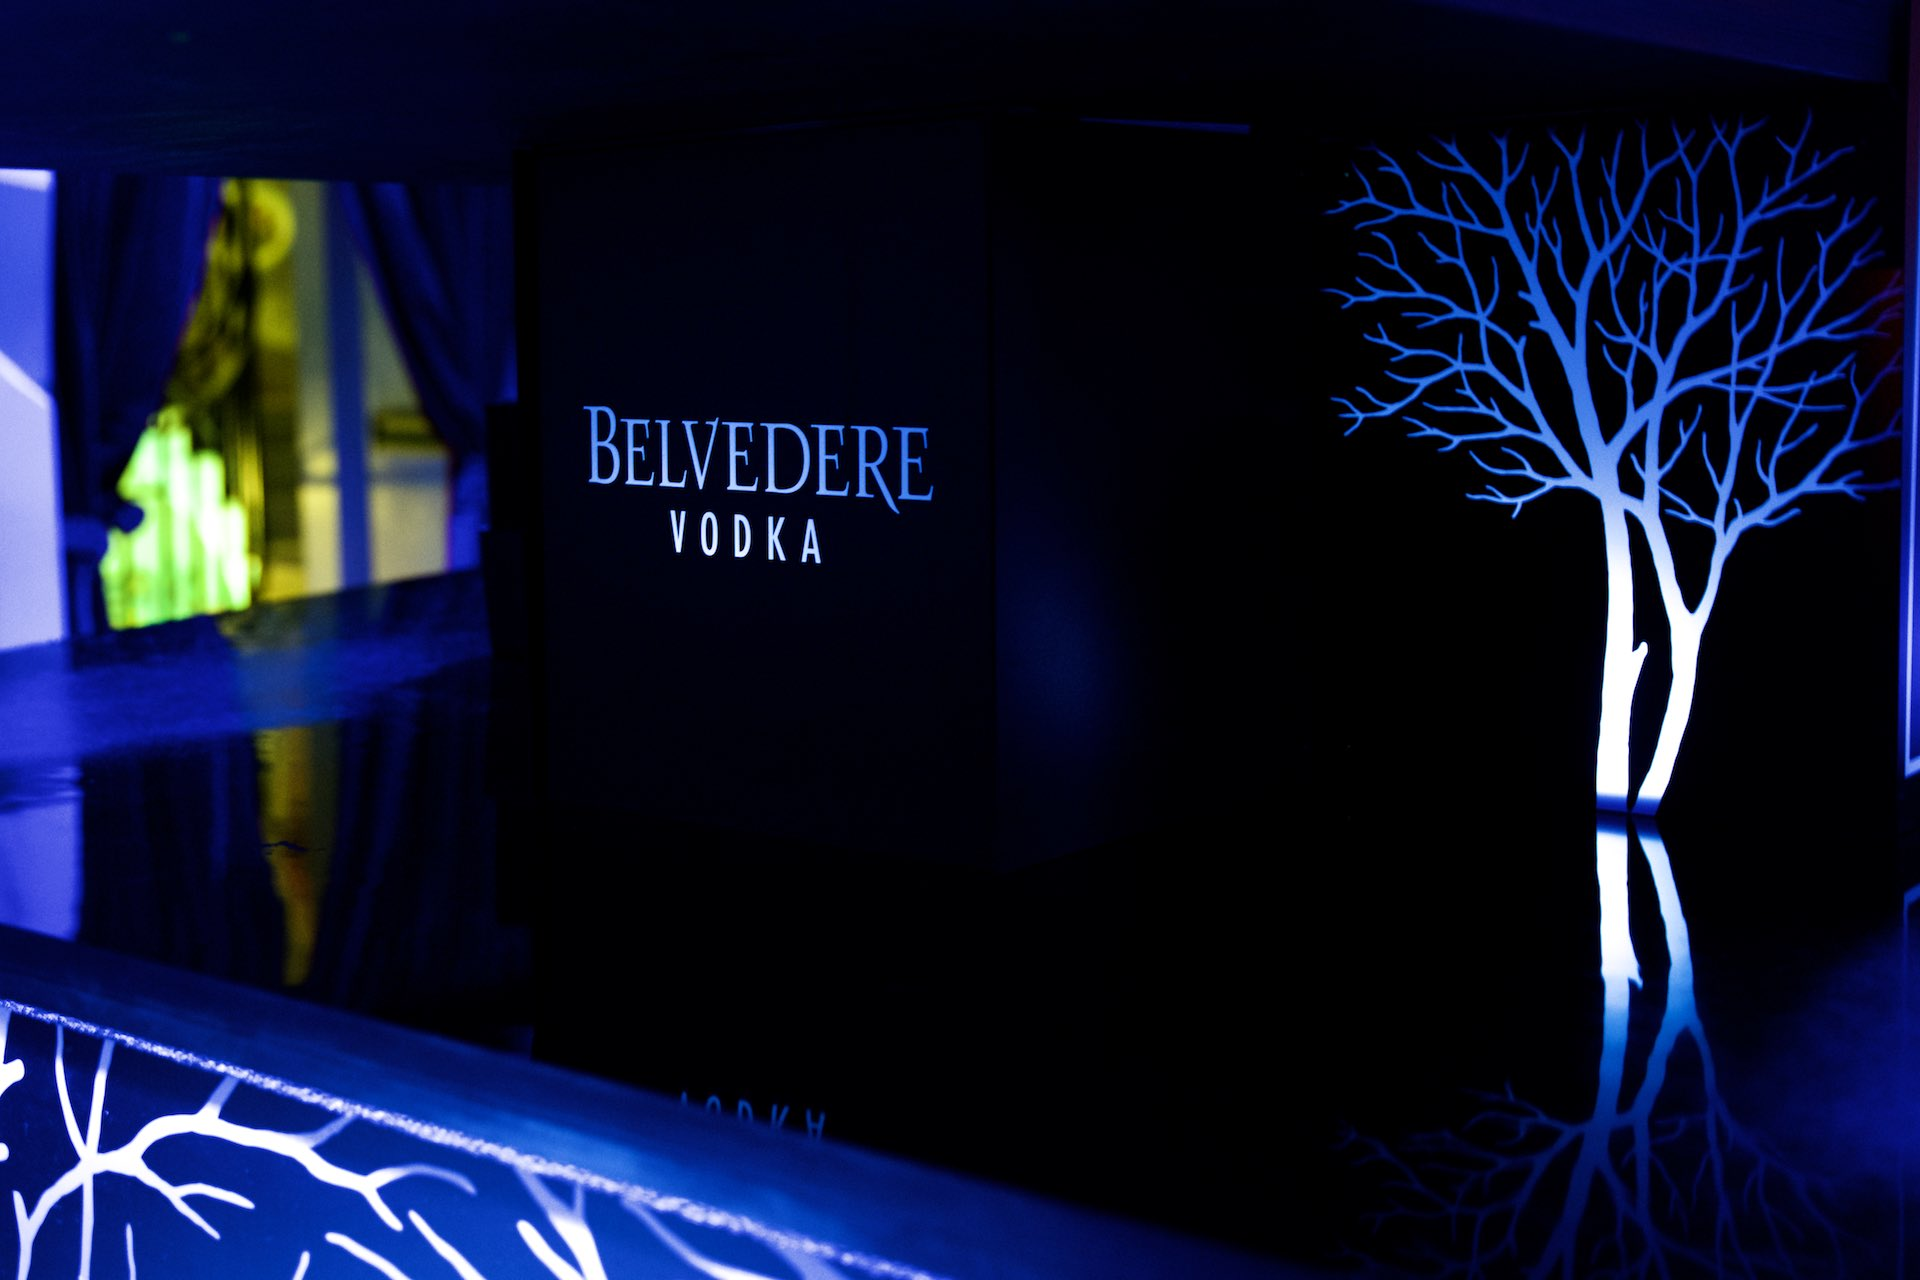 BELVEDERE_VODKA_170326_0006